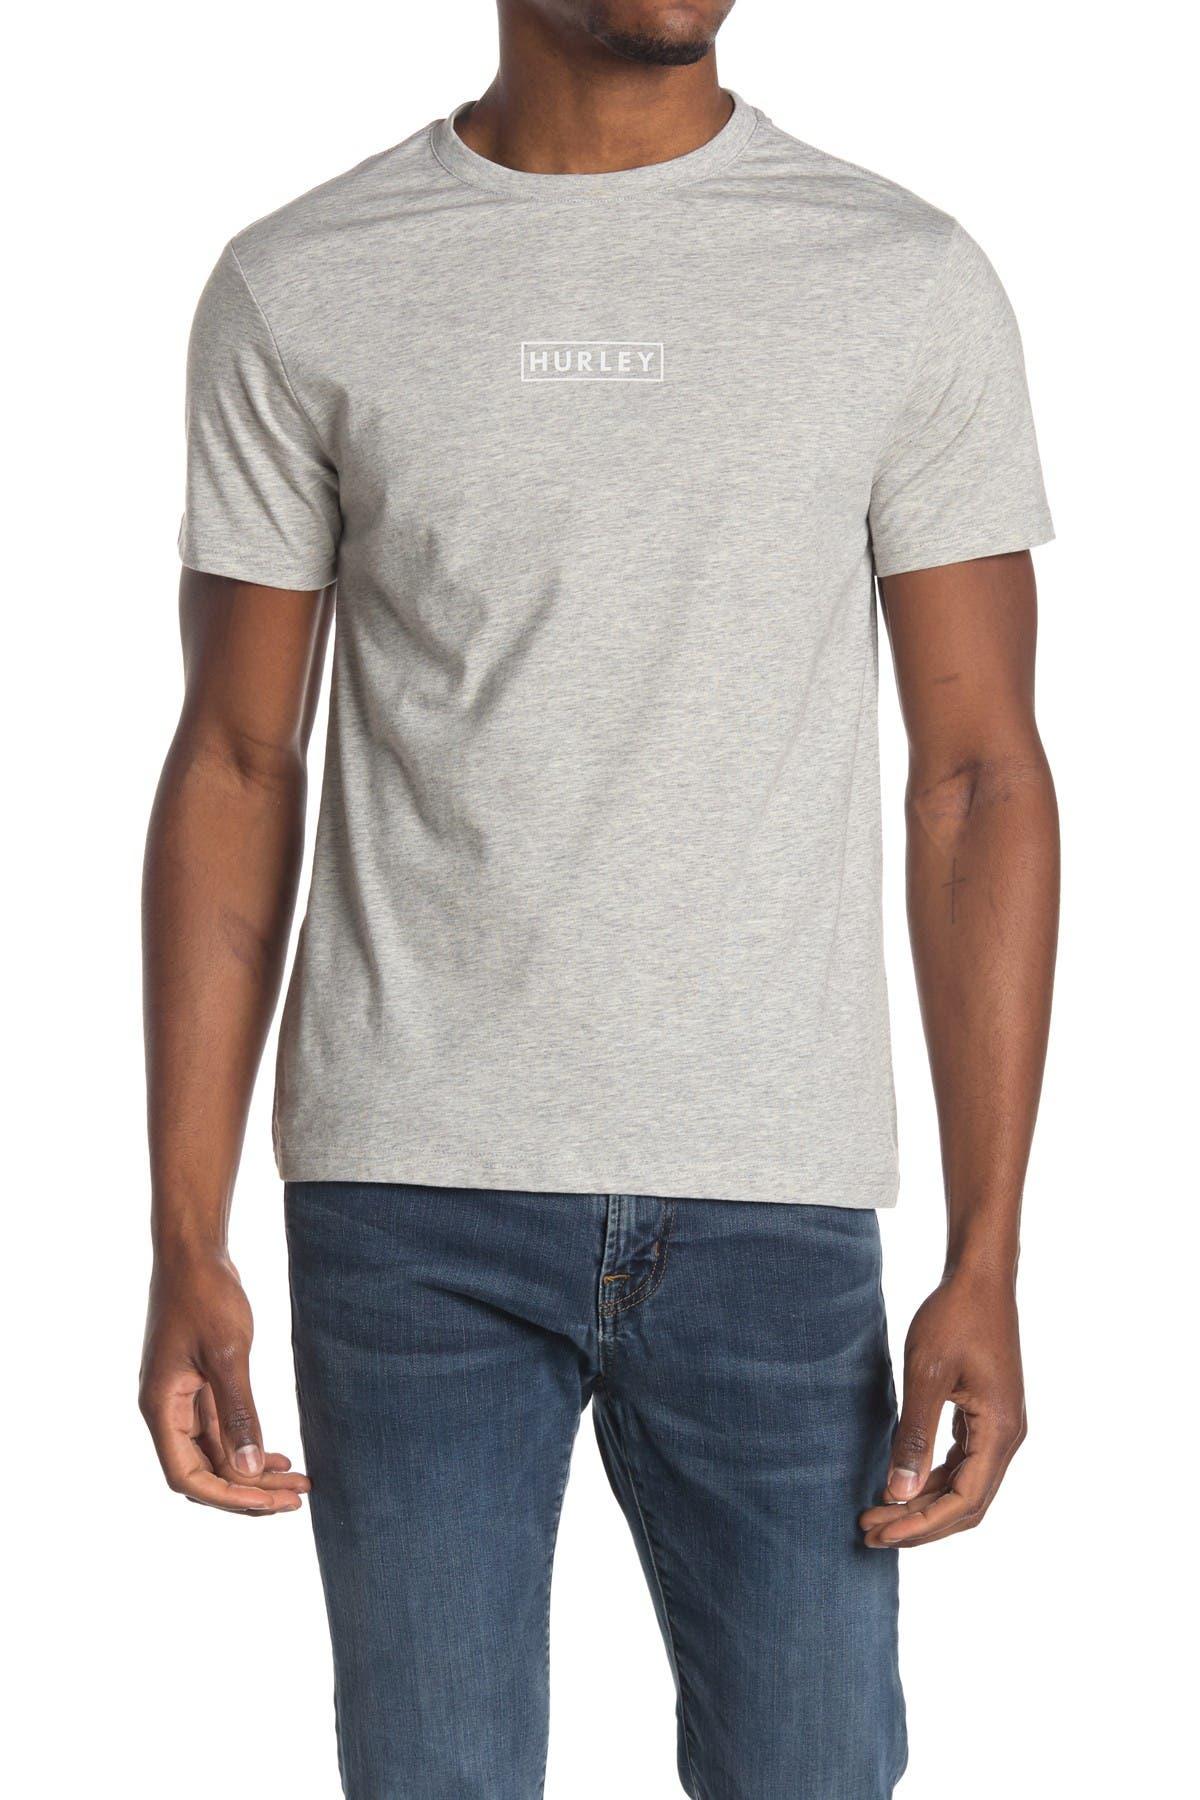 Image of Hurley Graphic Logo T-Shirt